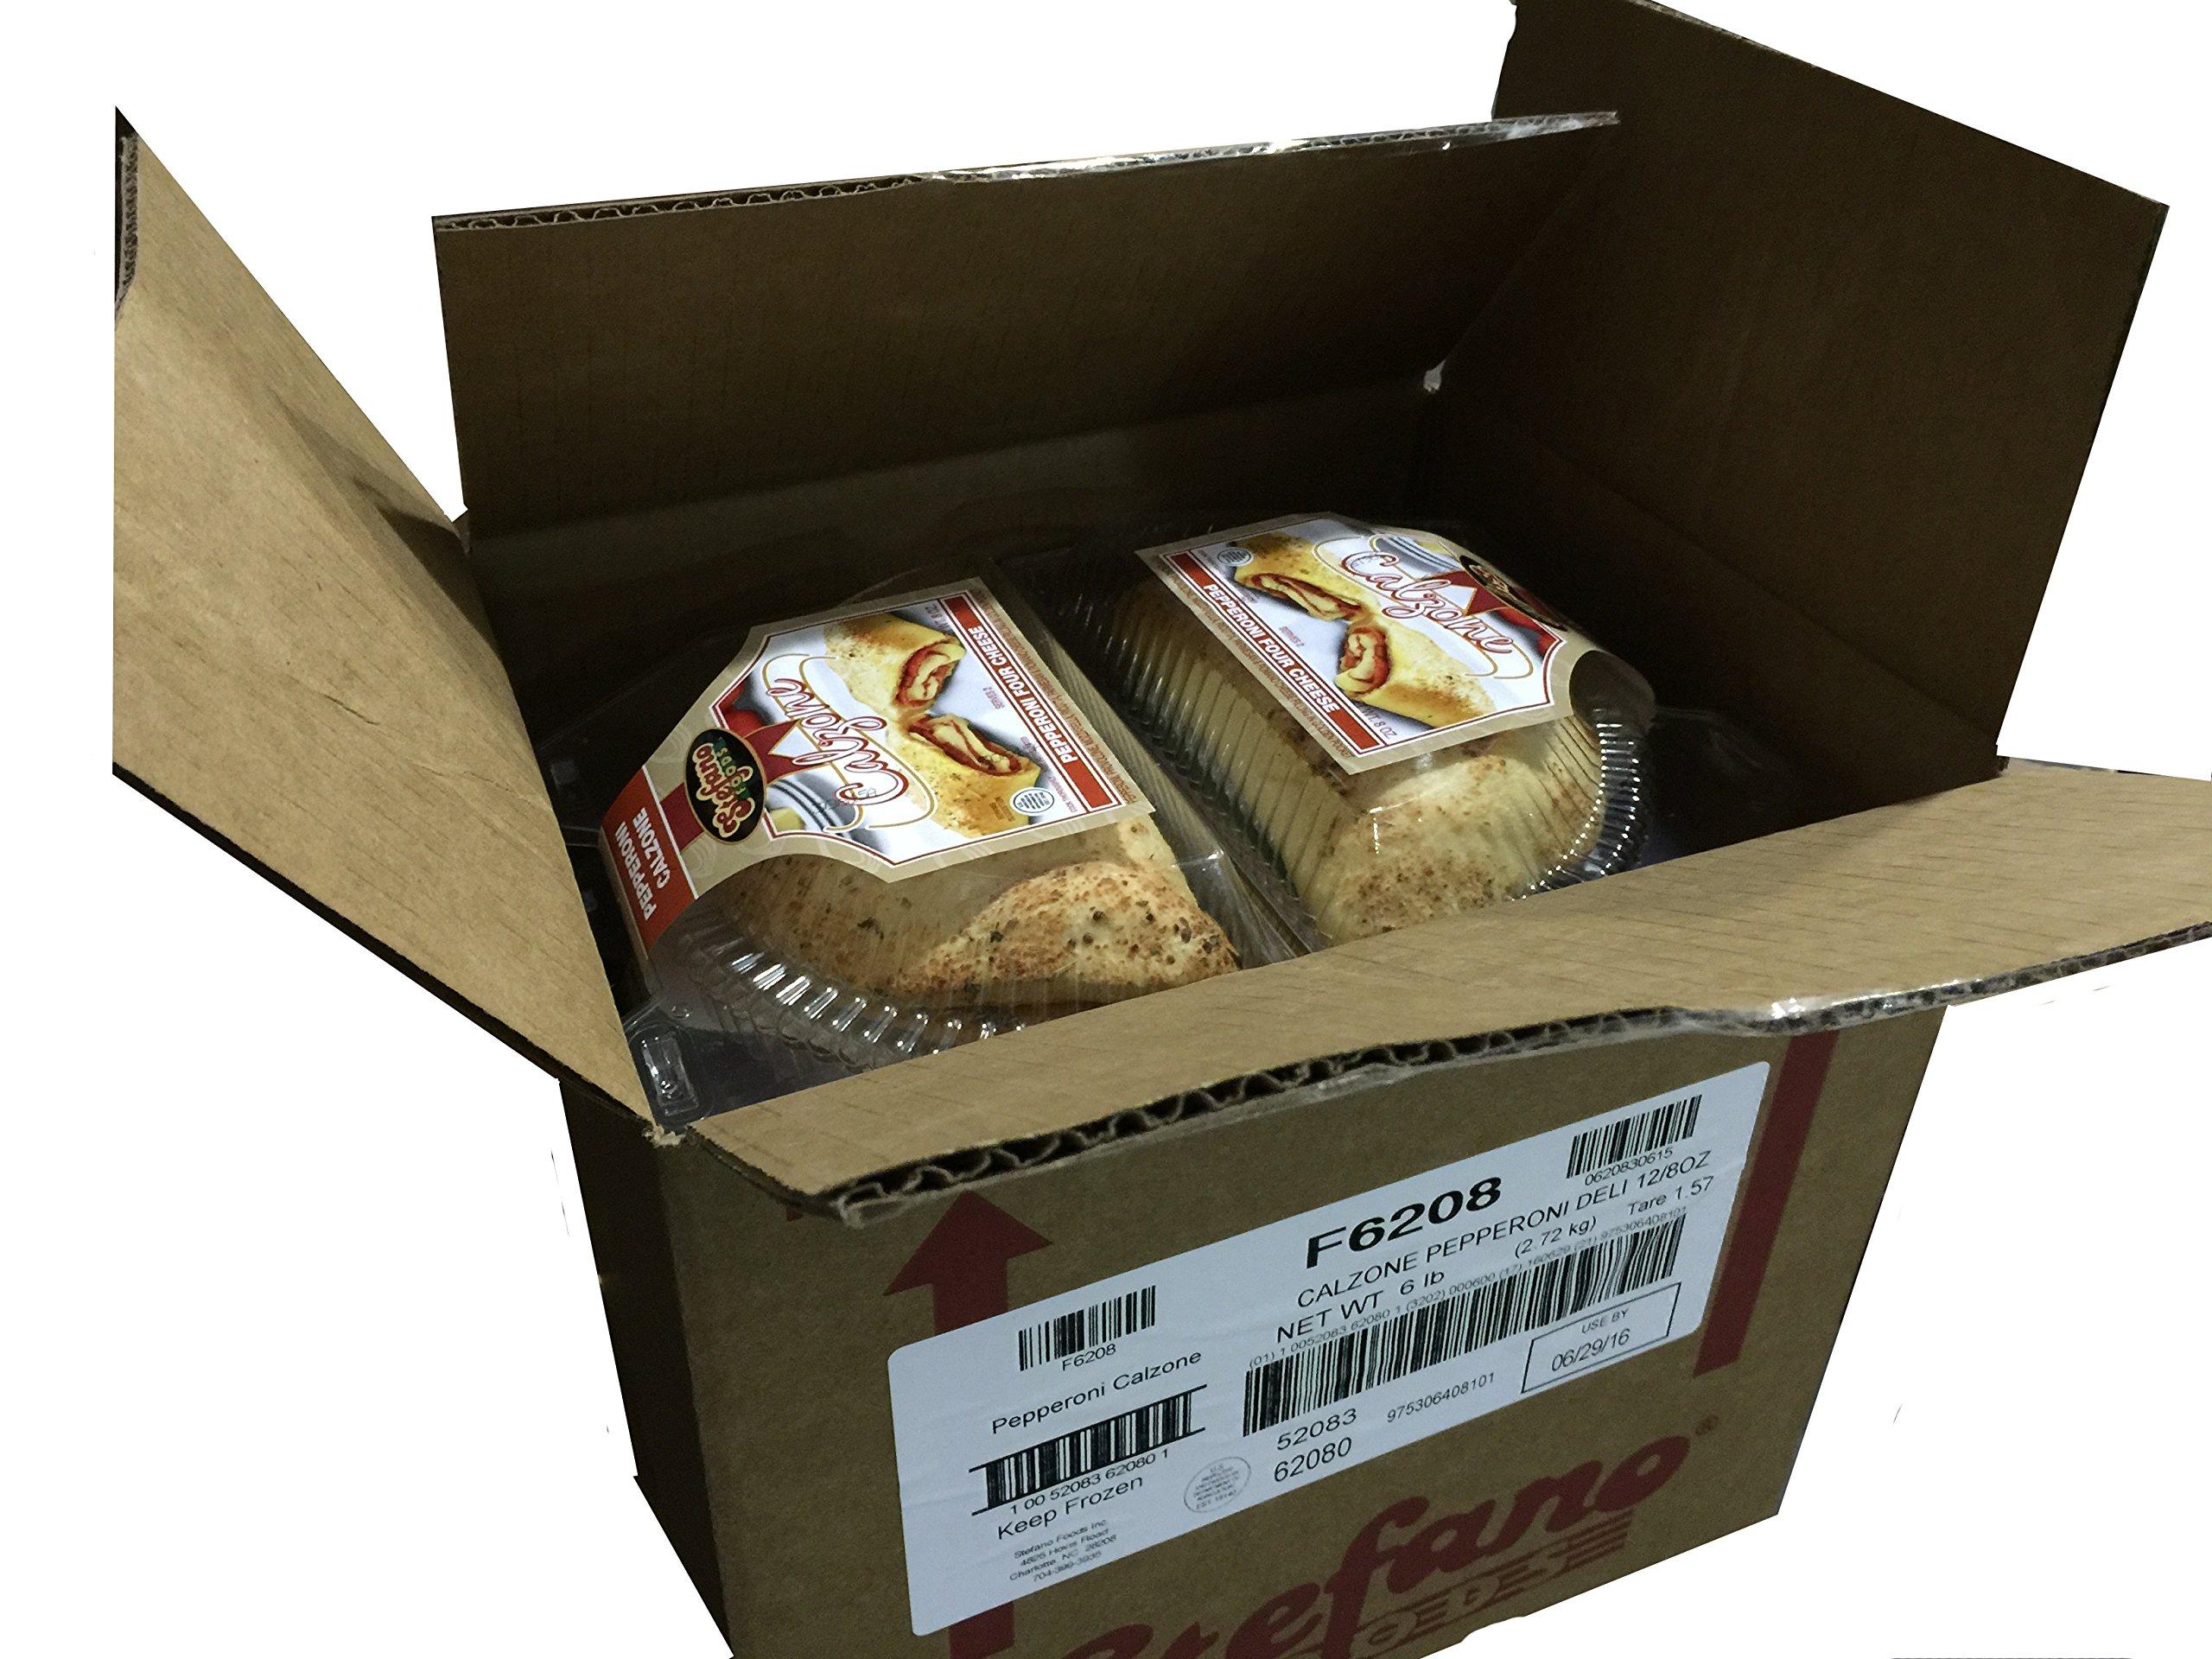 Stefano Foods Pepperoni Calzone, 8 oz., (12 per case)